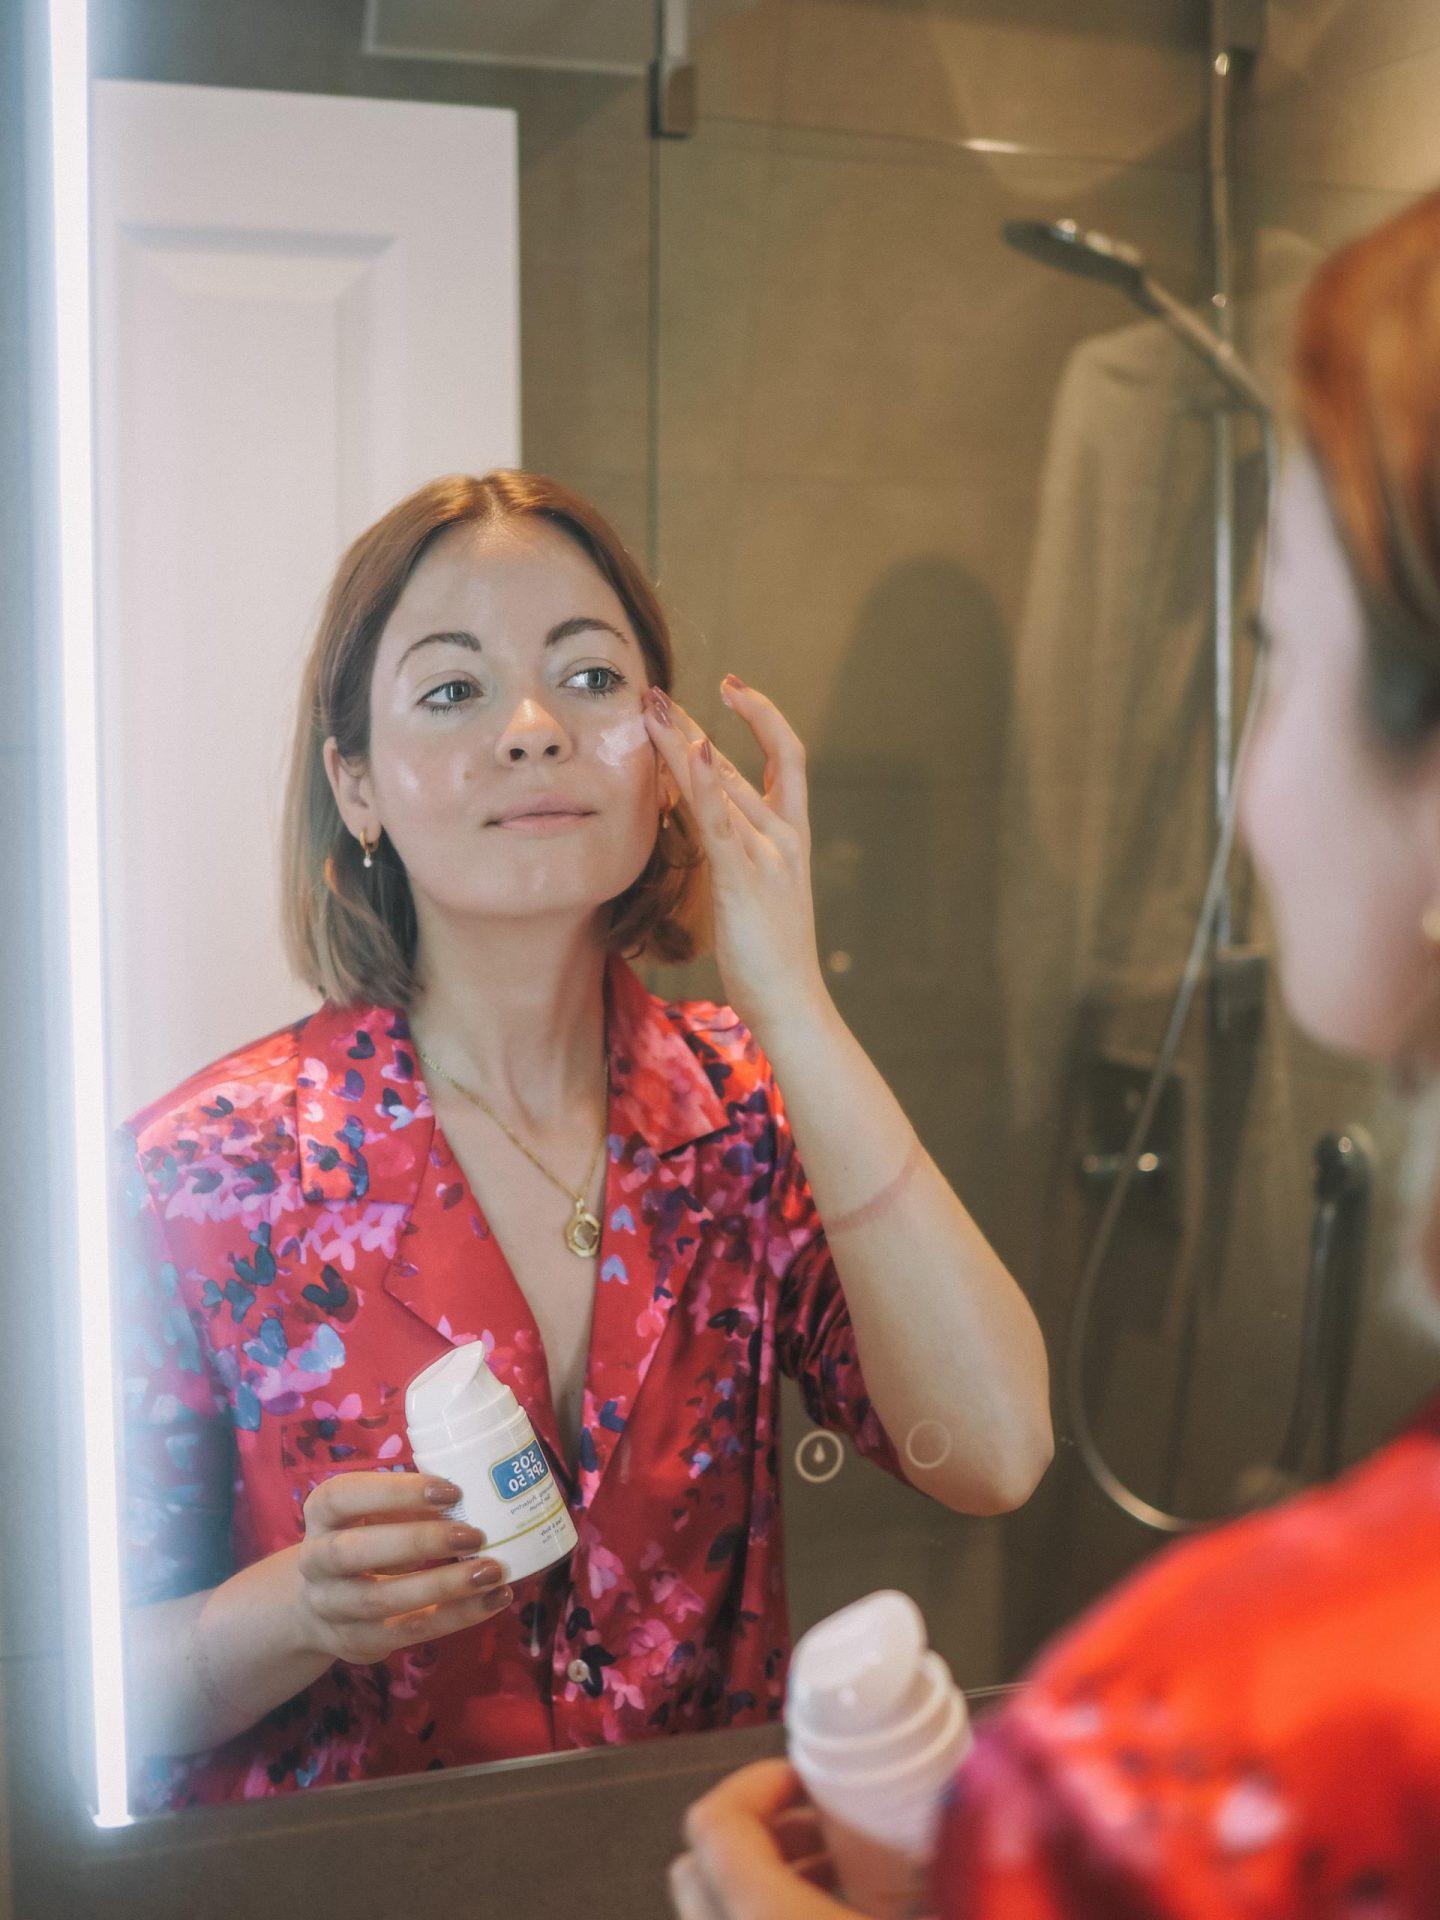 The Best Skincare For Sensitive Skin